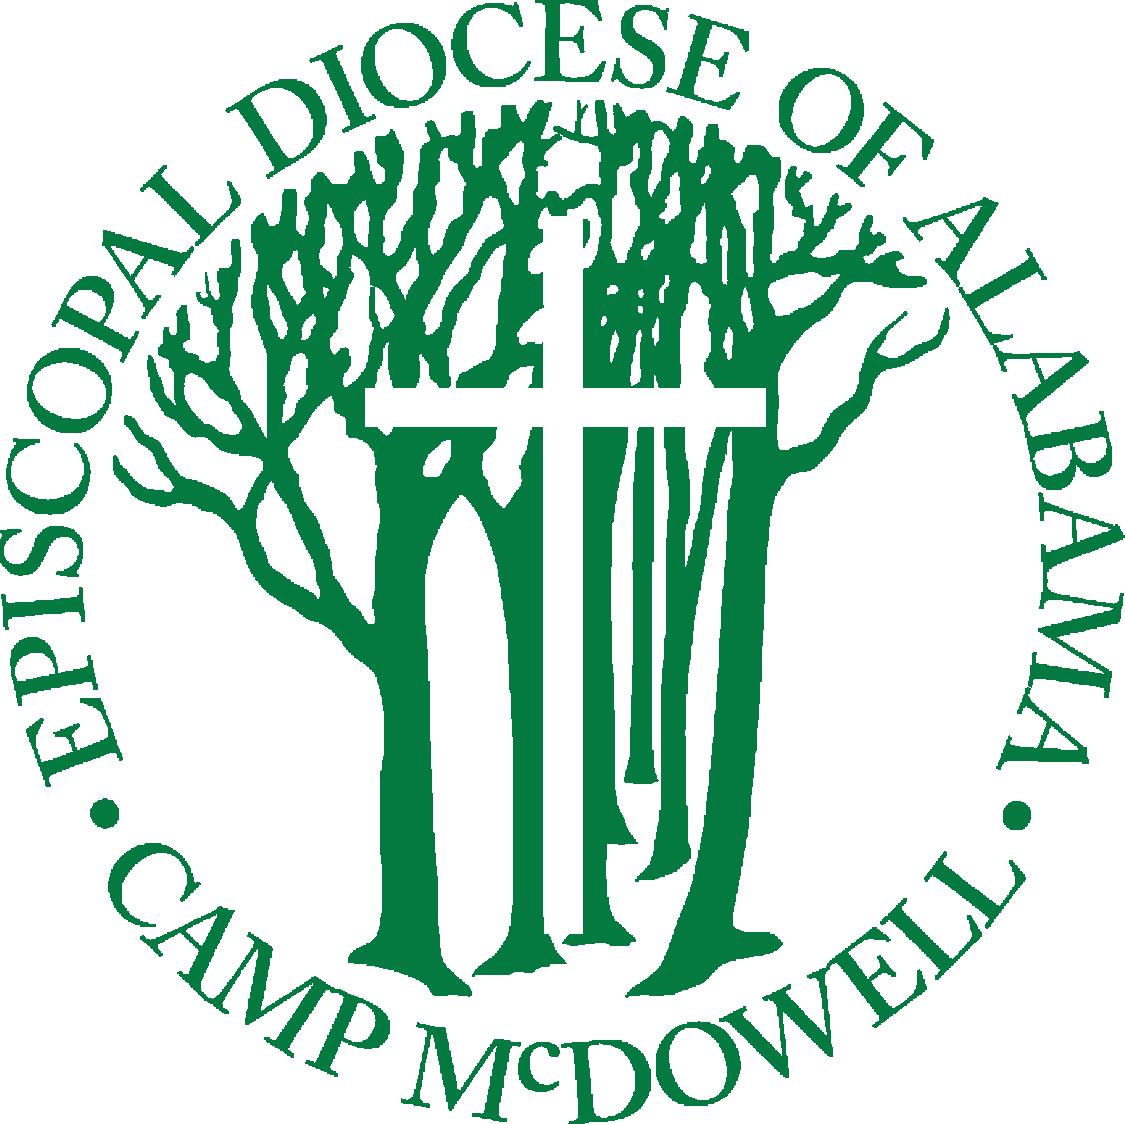 V2 Camp McDowell